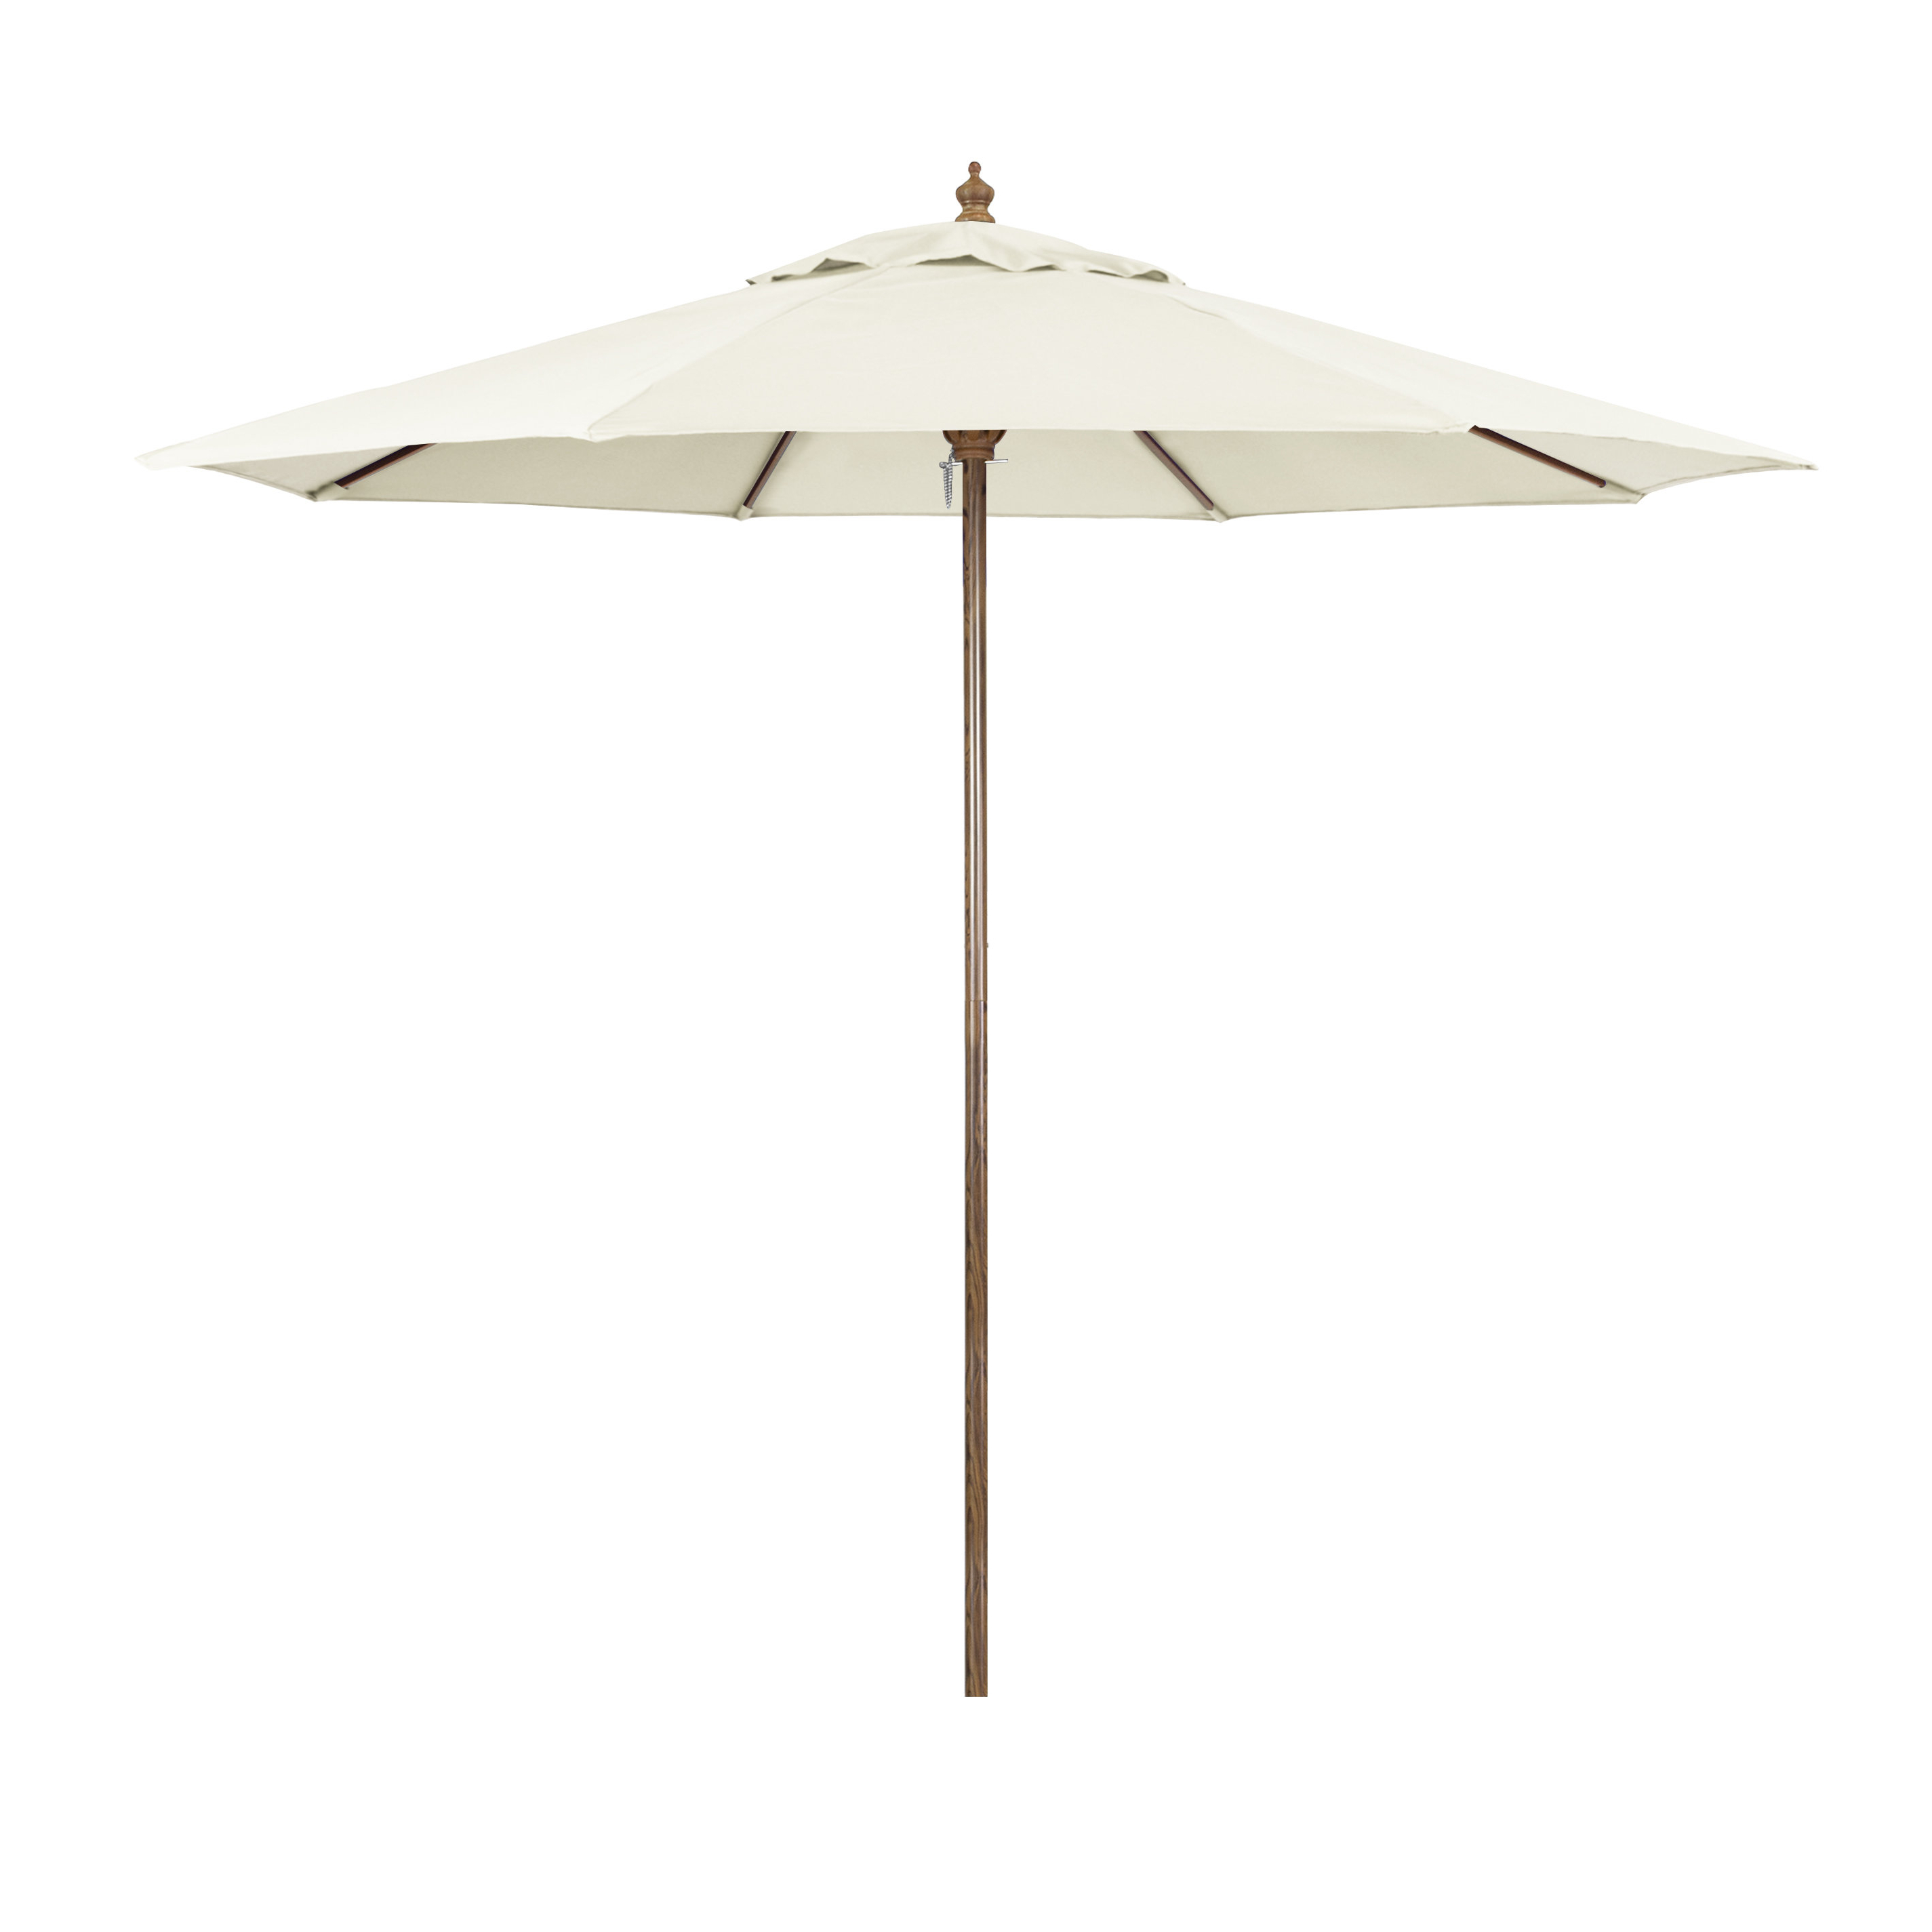 Hapeville Market Umbrellas For Latest Ryant 9' Market Umbrella (Gallery 9 of 20)